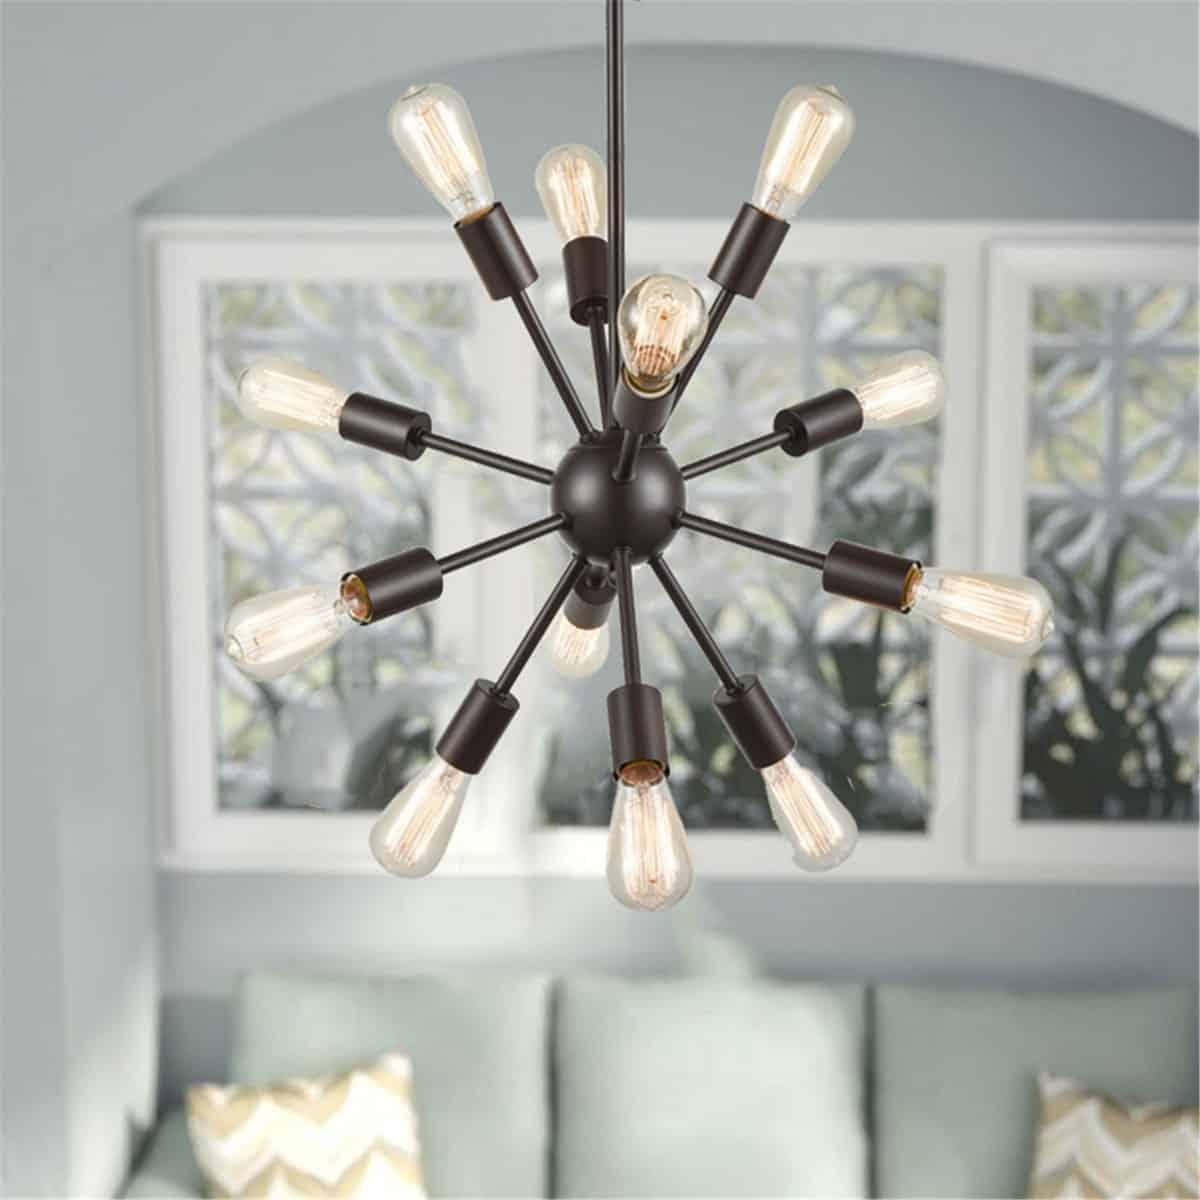 Modern 12-Light Sputnik Chandelier Rod-Hung, Bronze